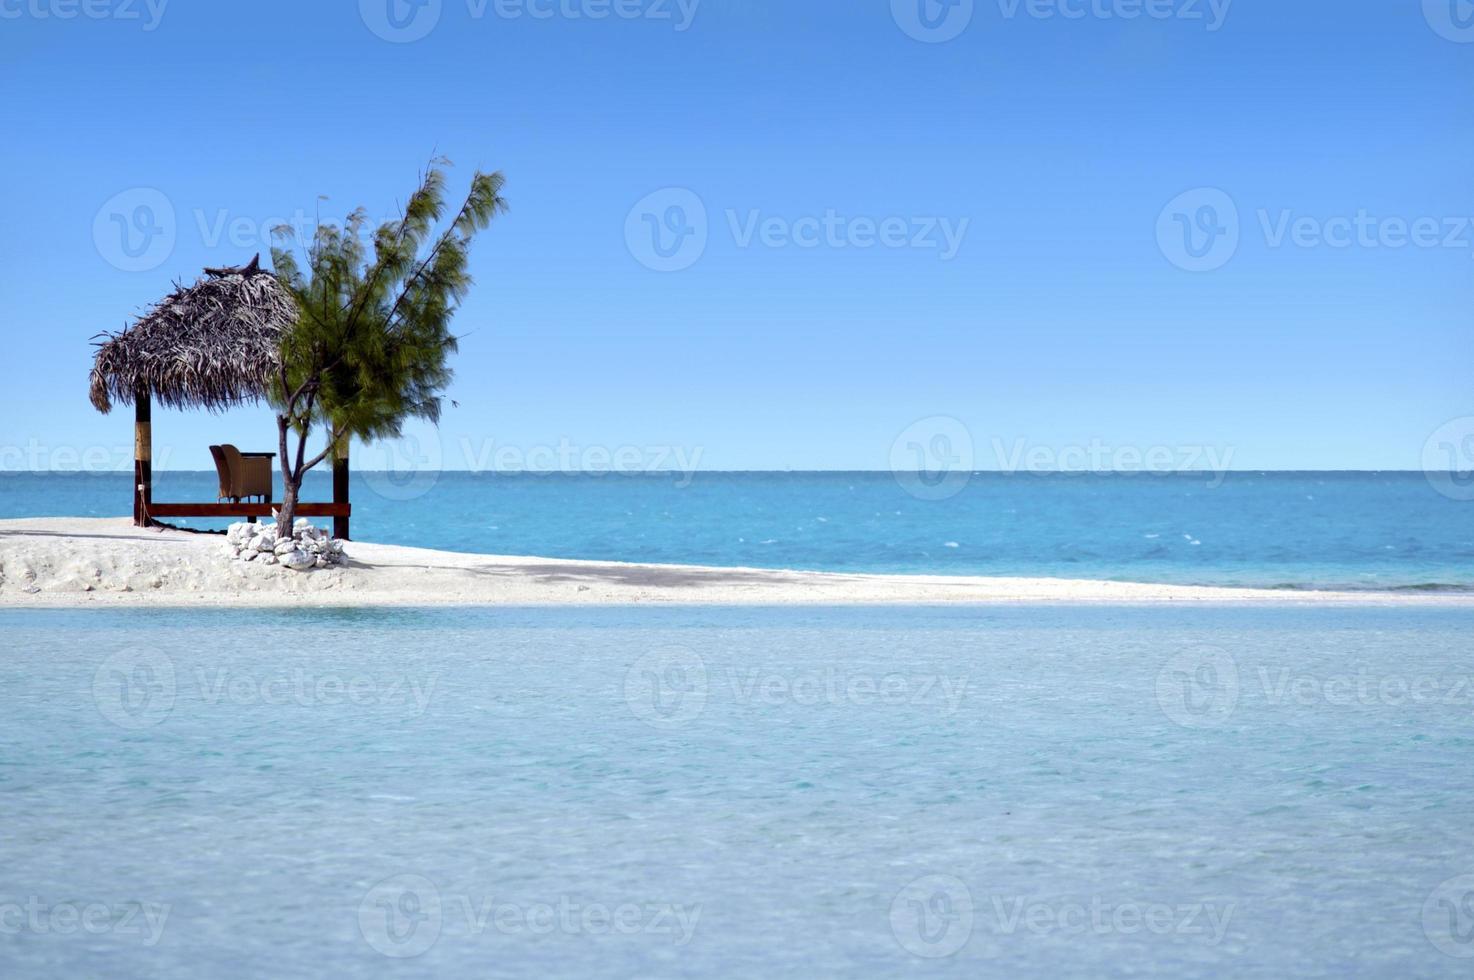 paisaje de la isla de arutanga en la laguna de aitutaki islas cook foto